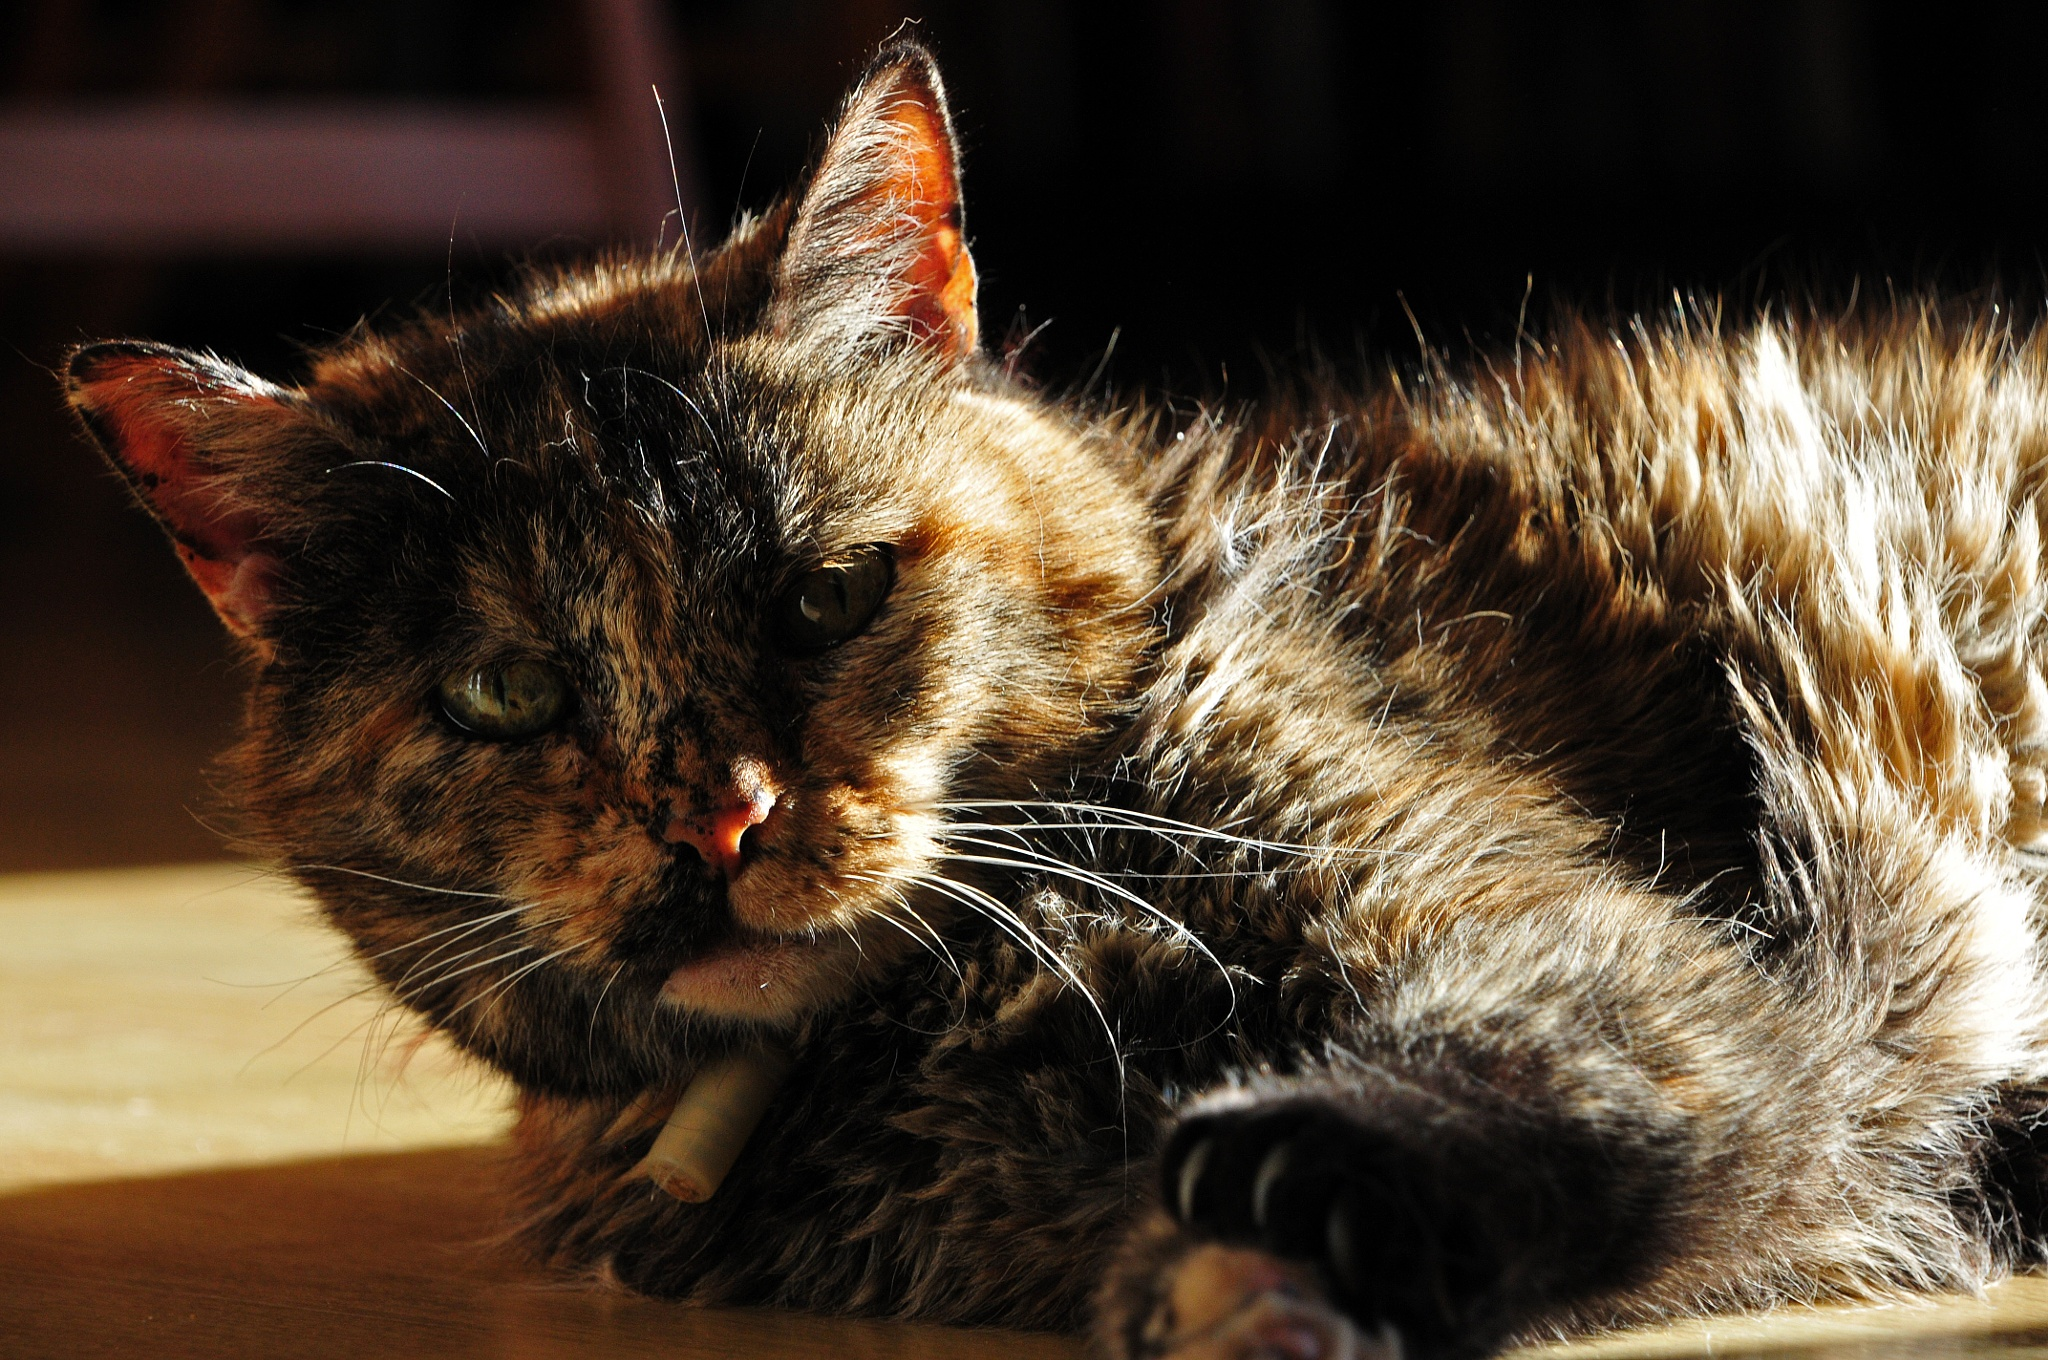 My Sunday morning sunbath by JeanGregoireMarin